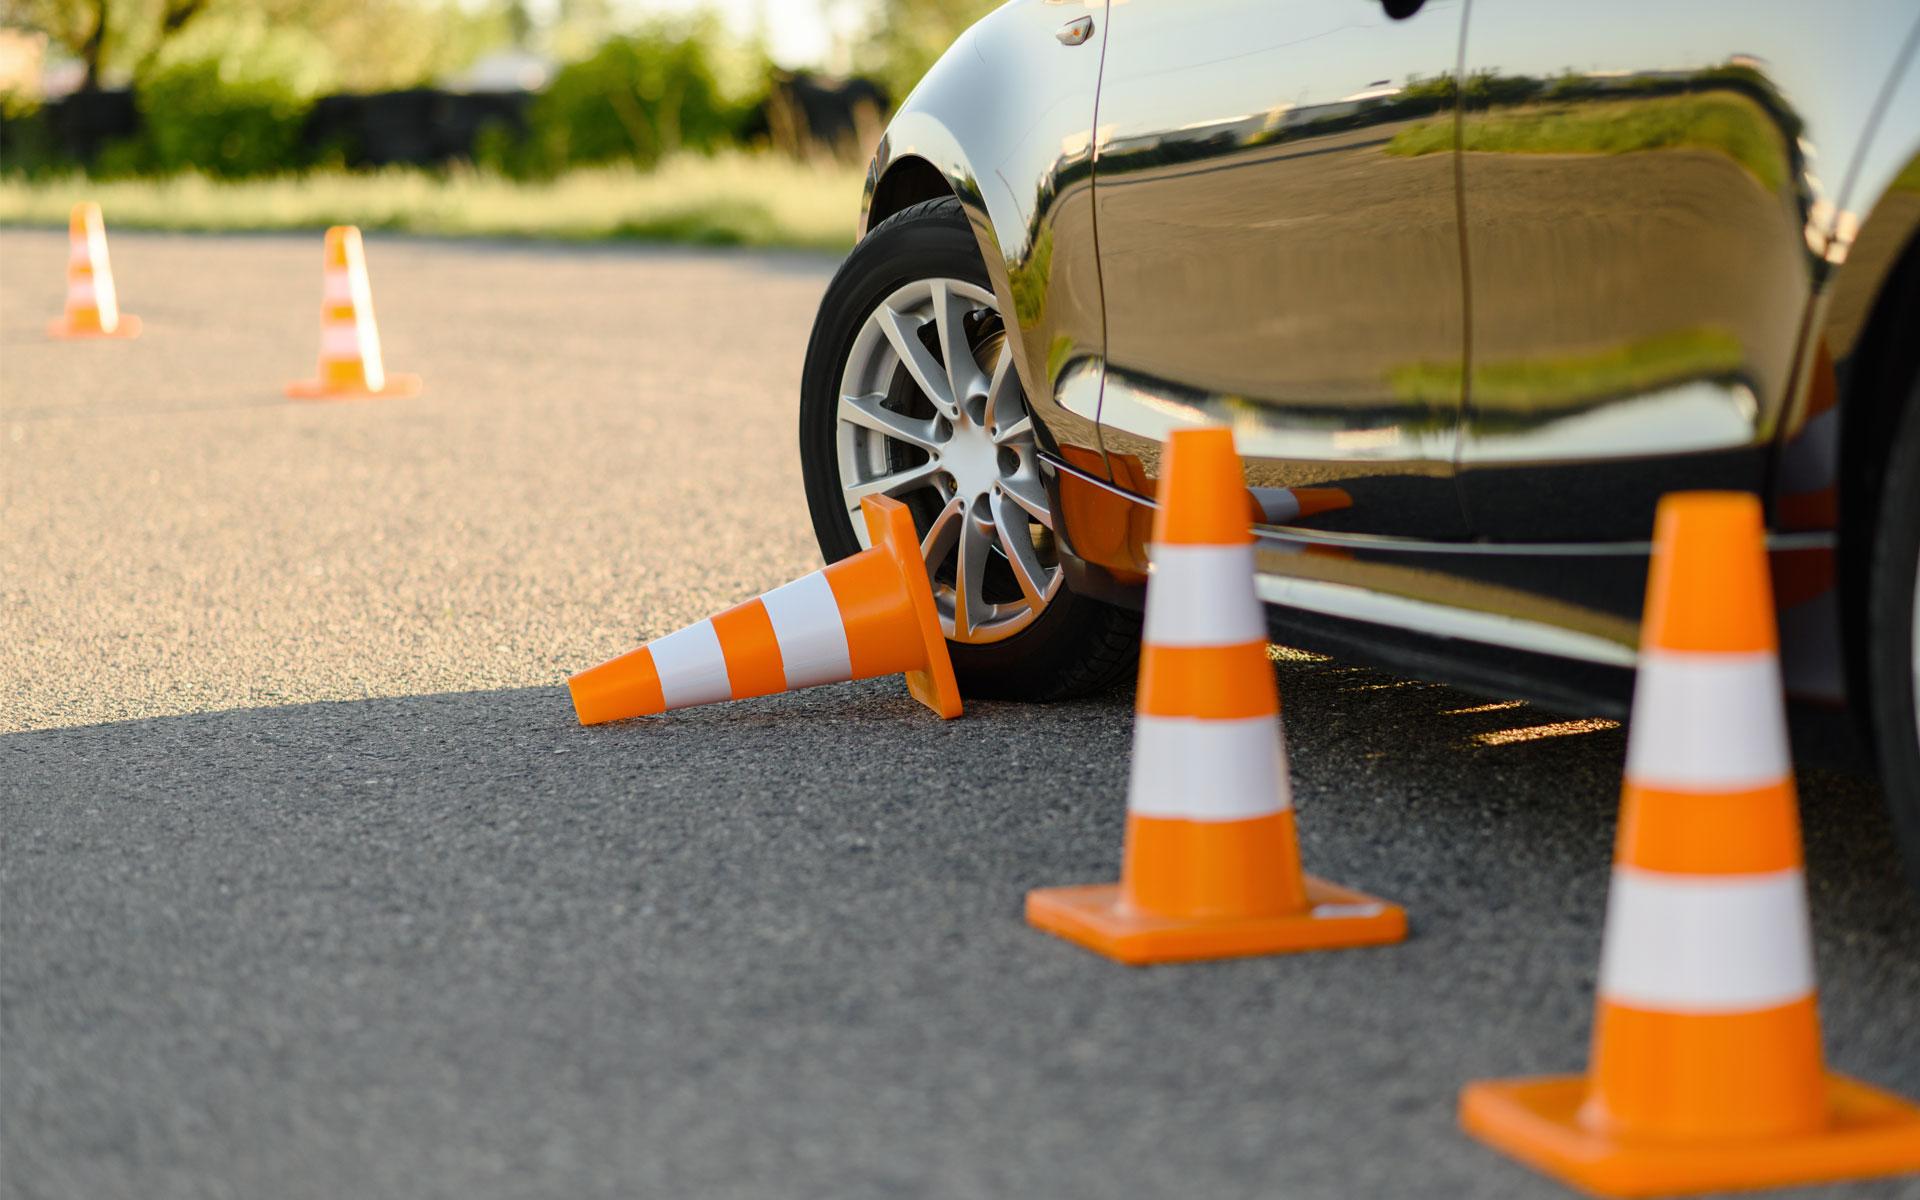 https://ecoleconduitelenvol.com/wp-content/uploads/2021/02/car-and-downed-cone-driving-school-concept-UCVJ6P8.jpg